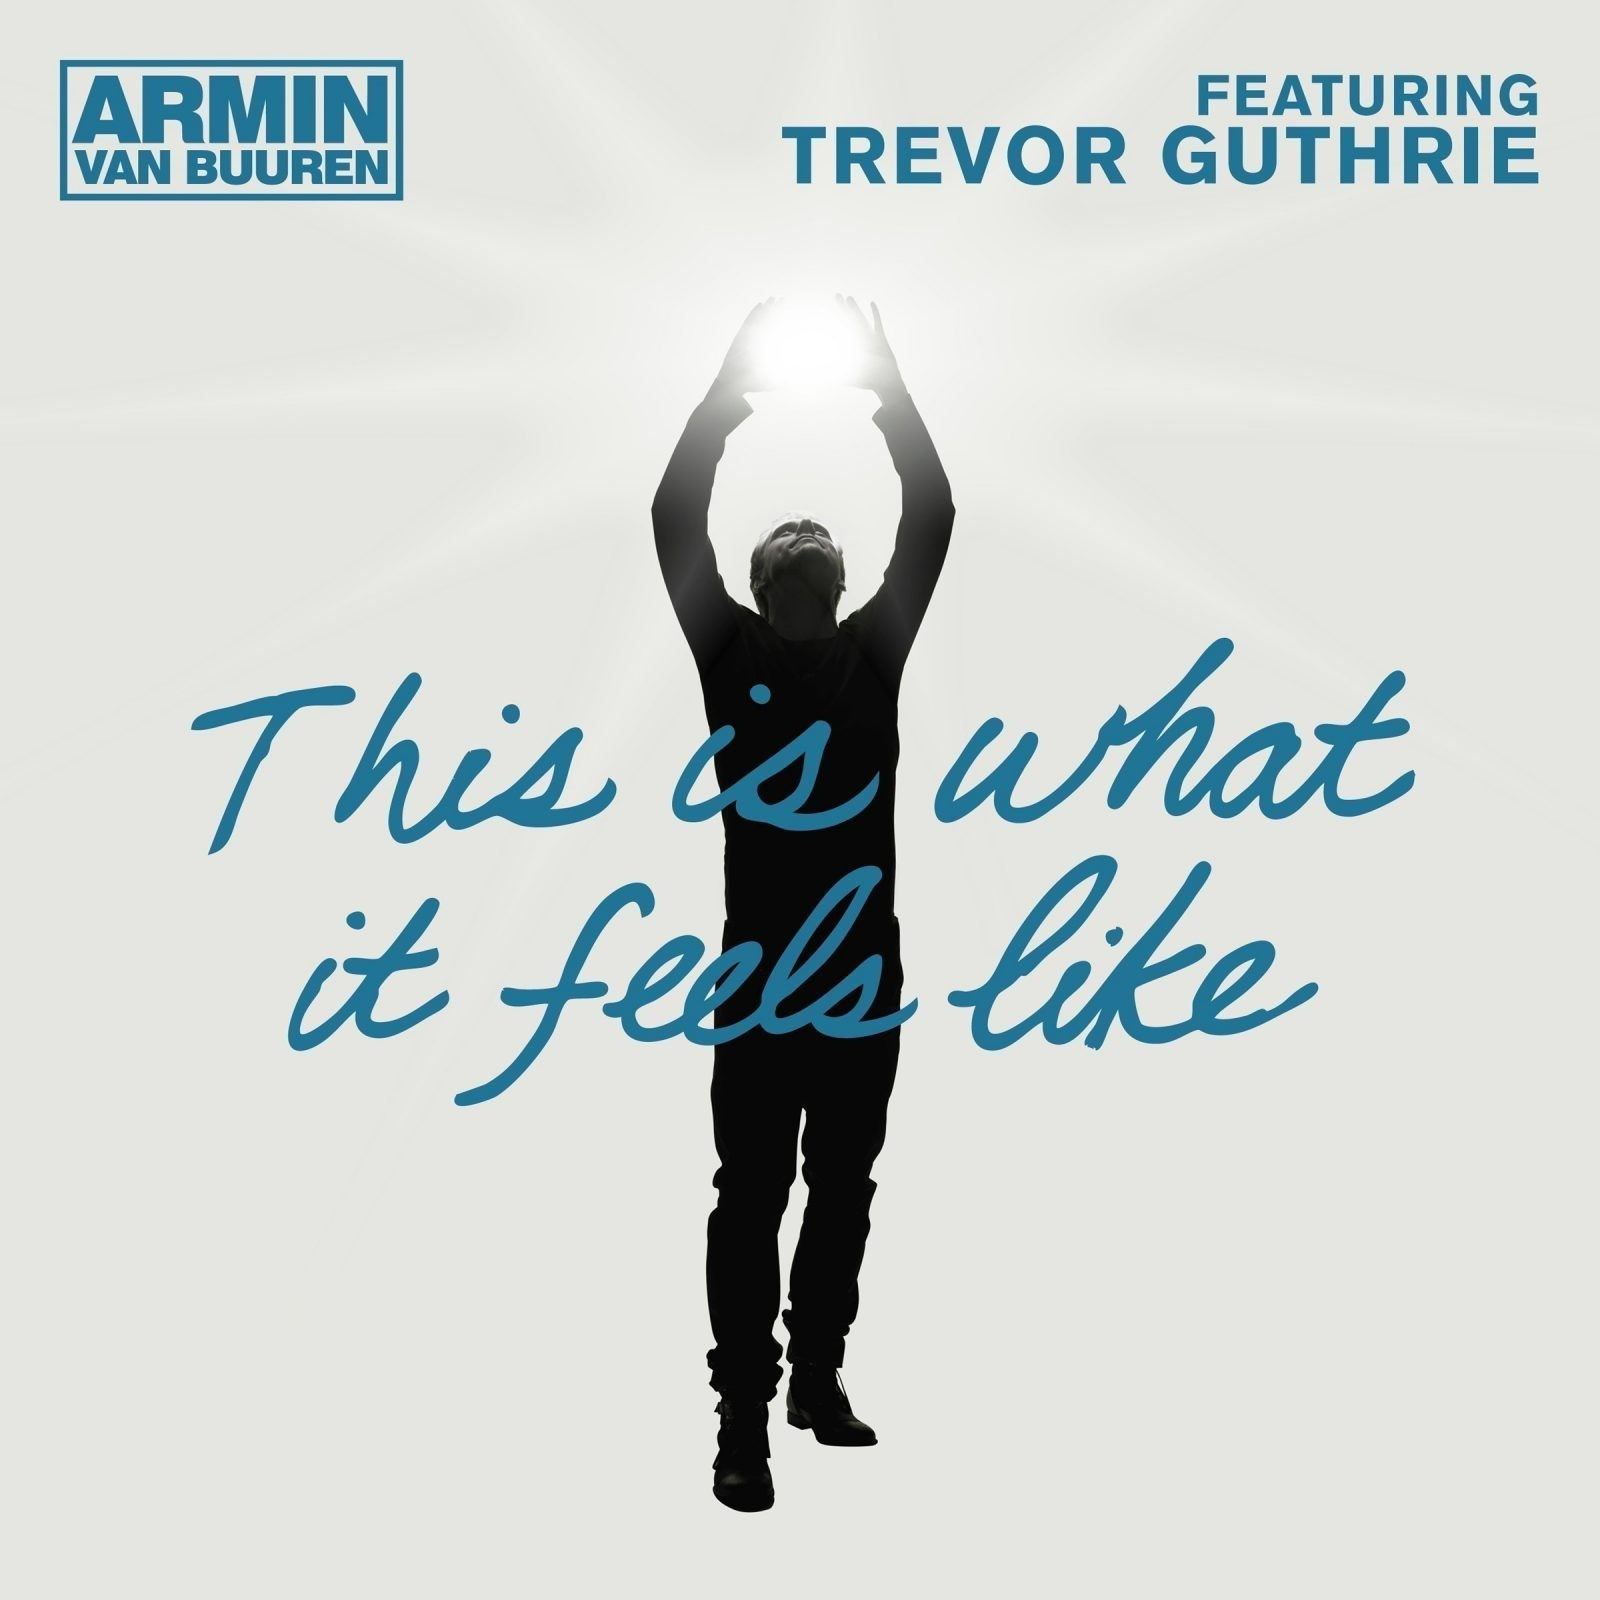 armin-van-buuren-feat.trevor-guthrie-what-it-feels-digital-cover.jpg